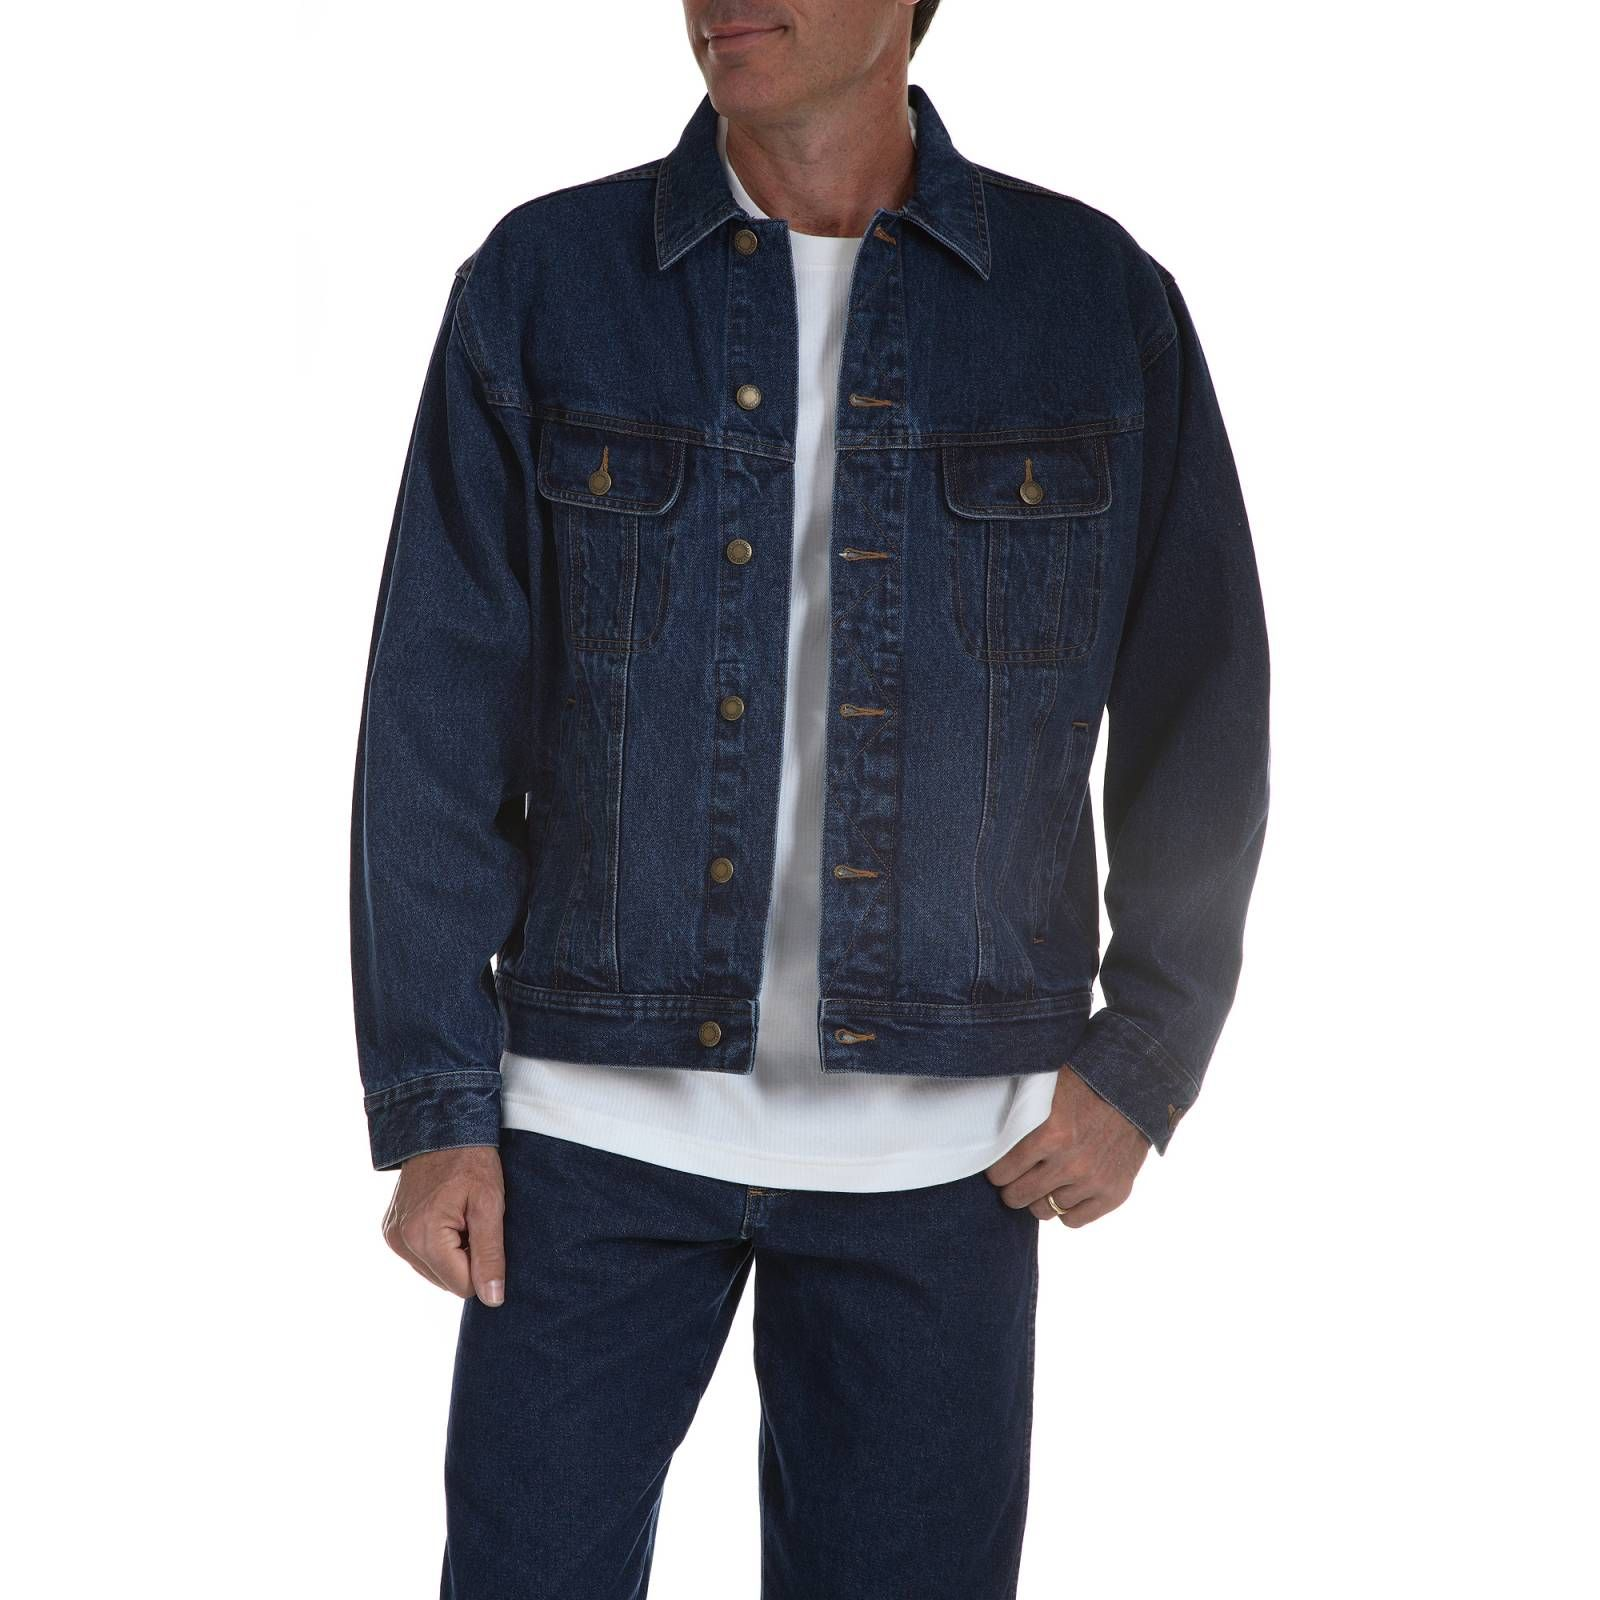 Wrangler Rugged Wear Denim Jacket Antique Indigo Vintage Indigo [ 1600 x 1600 Pixel ]